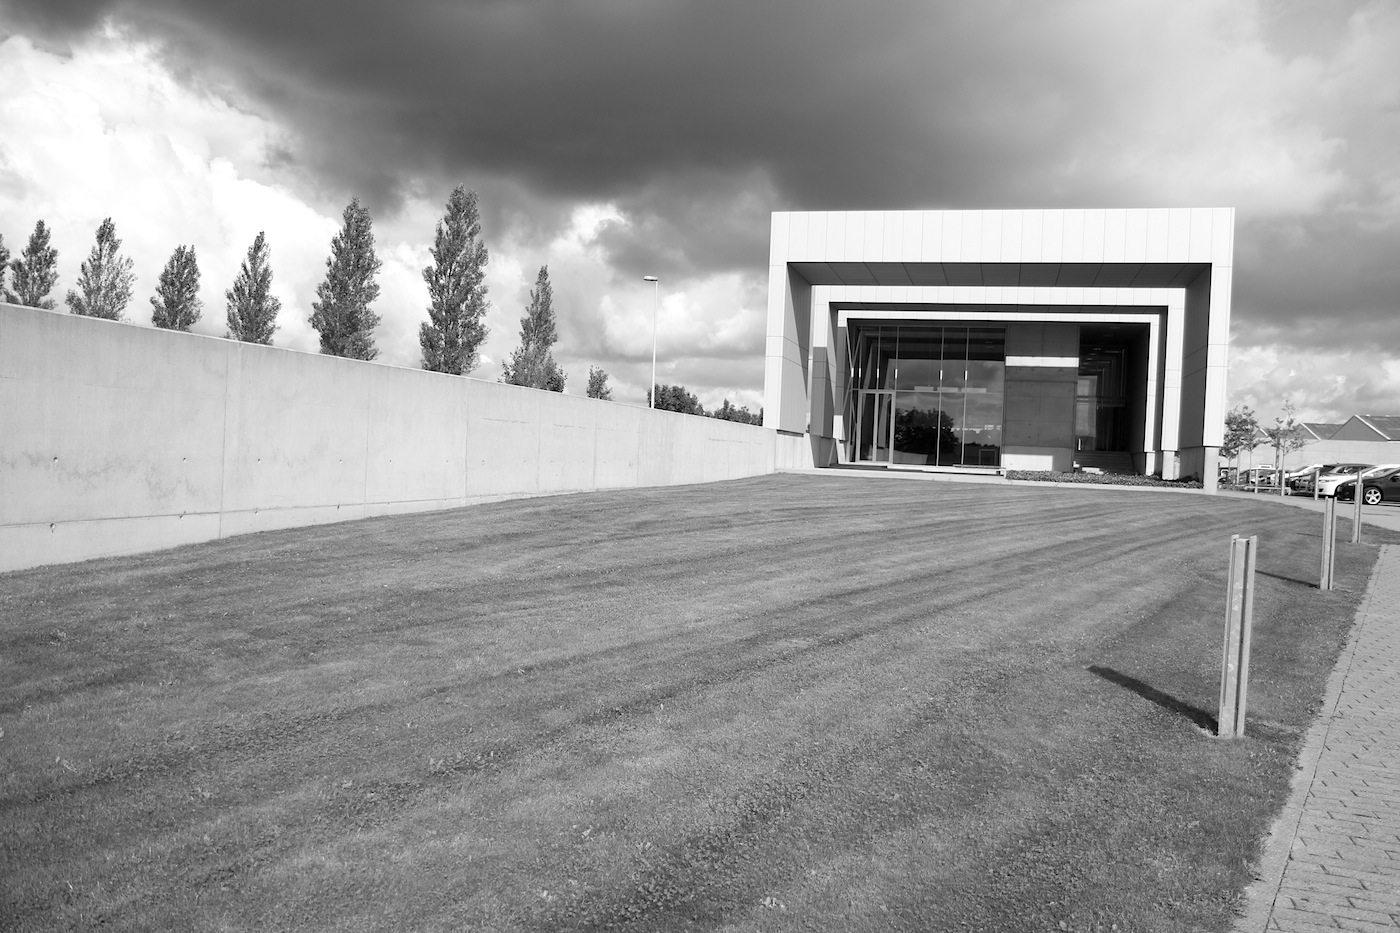 arnes edelbrausen horsens d nemark the link stadt land architektur. Black Bedroom Furniture Sets. Home Design Ideas